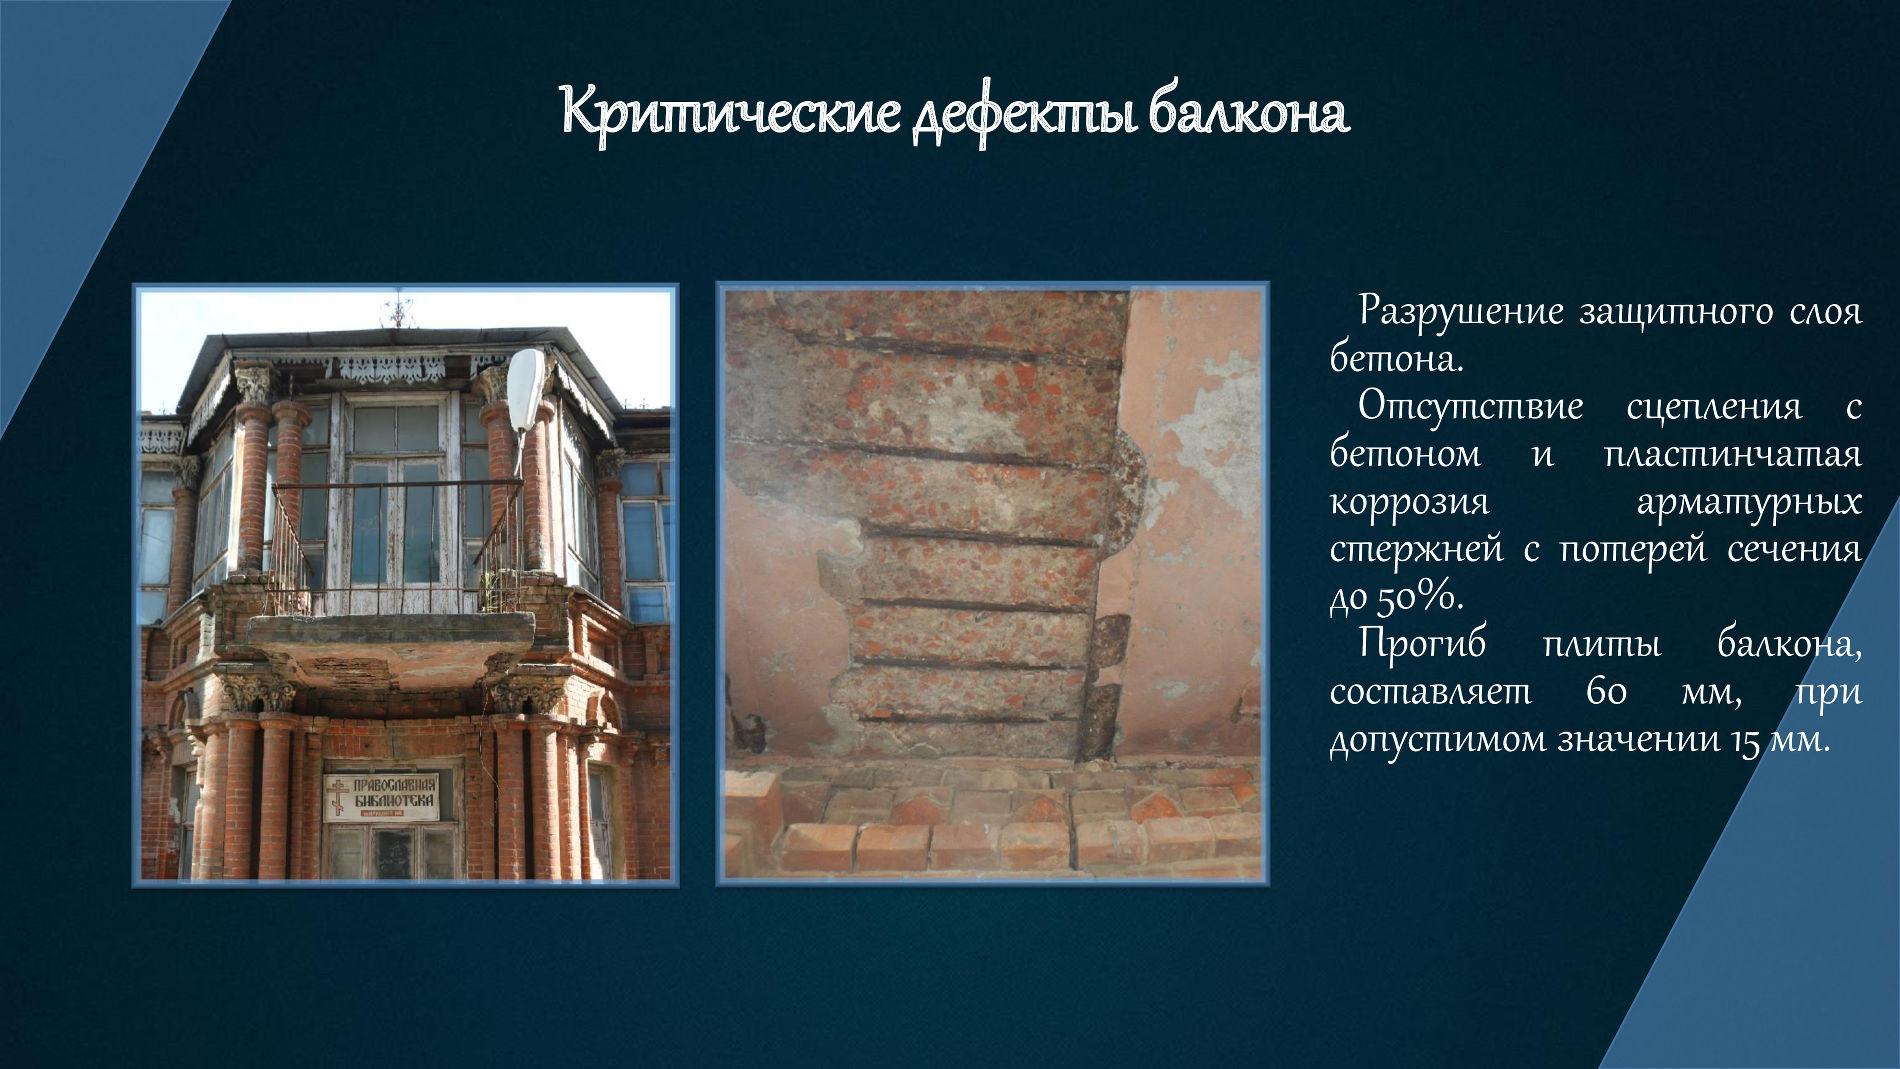 ©Страница из презентации администрации Краснодара, krd.ru